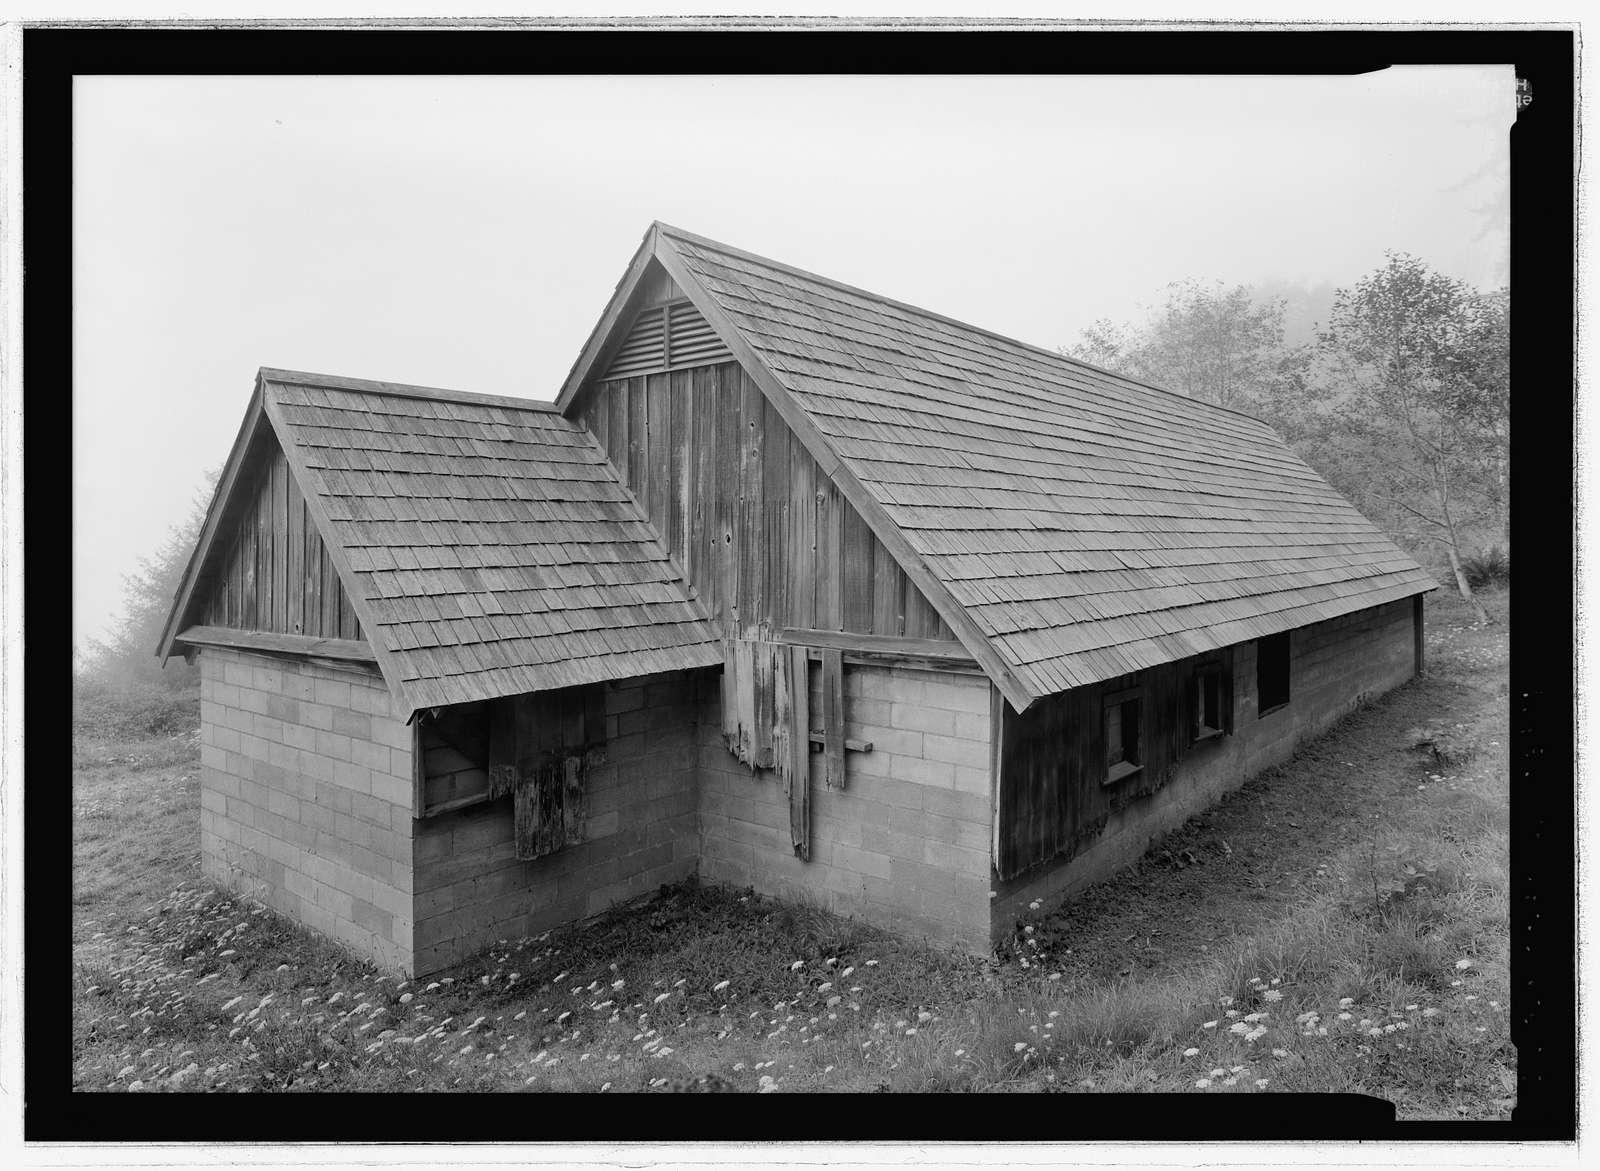 Radar Station B-71, Operations Building, Coastal Drive, Klamath, Del Norte County, CA